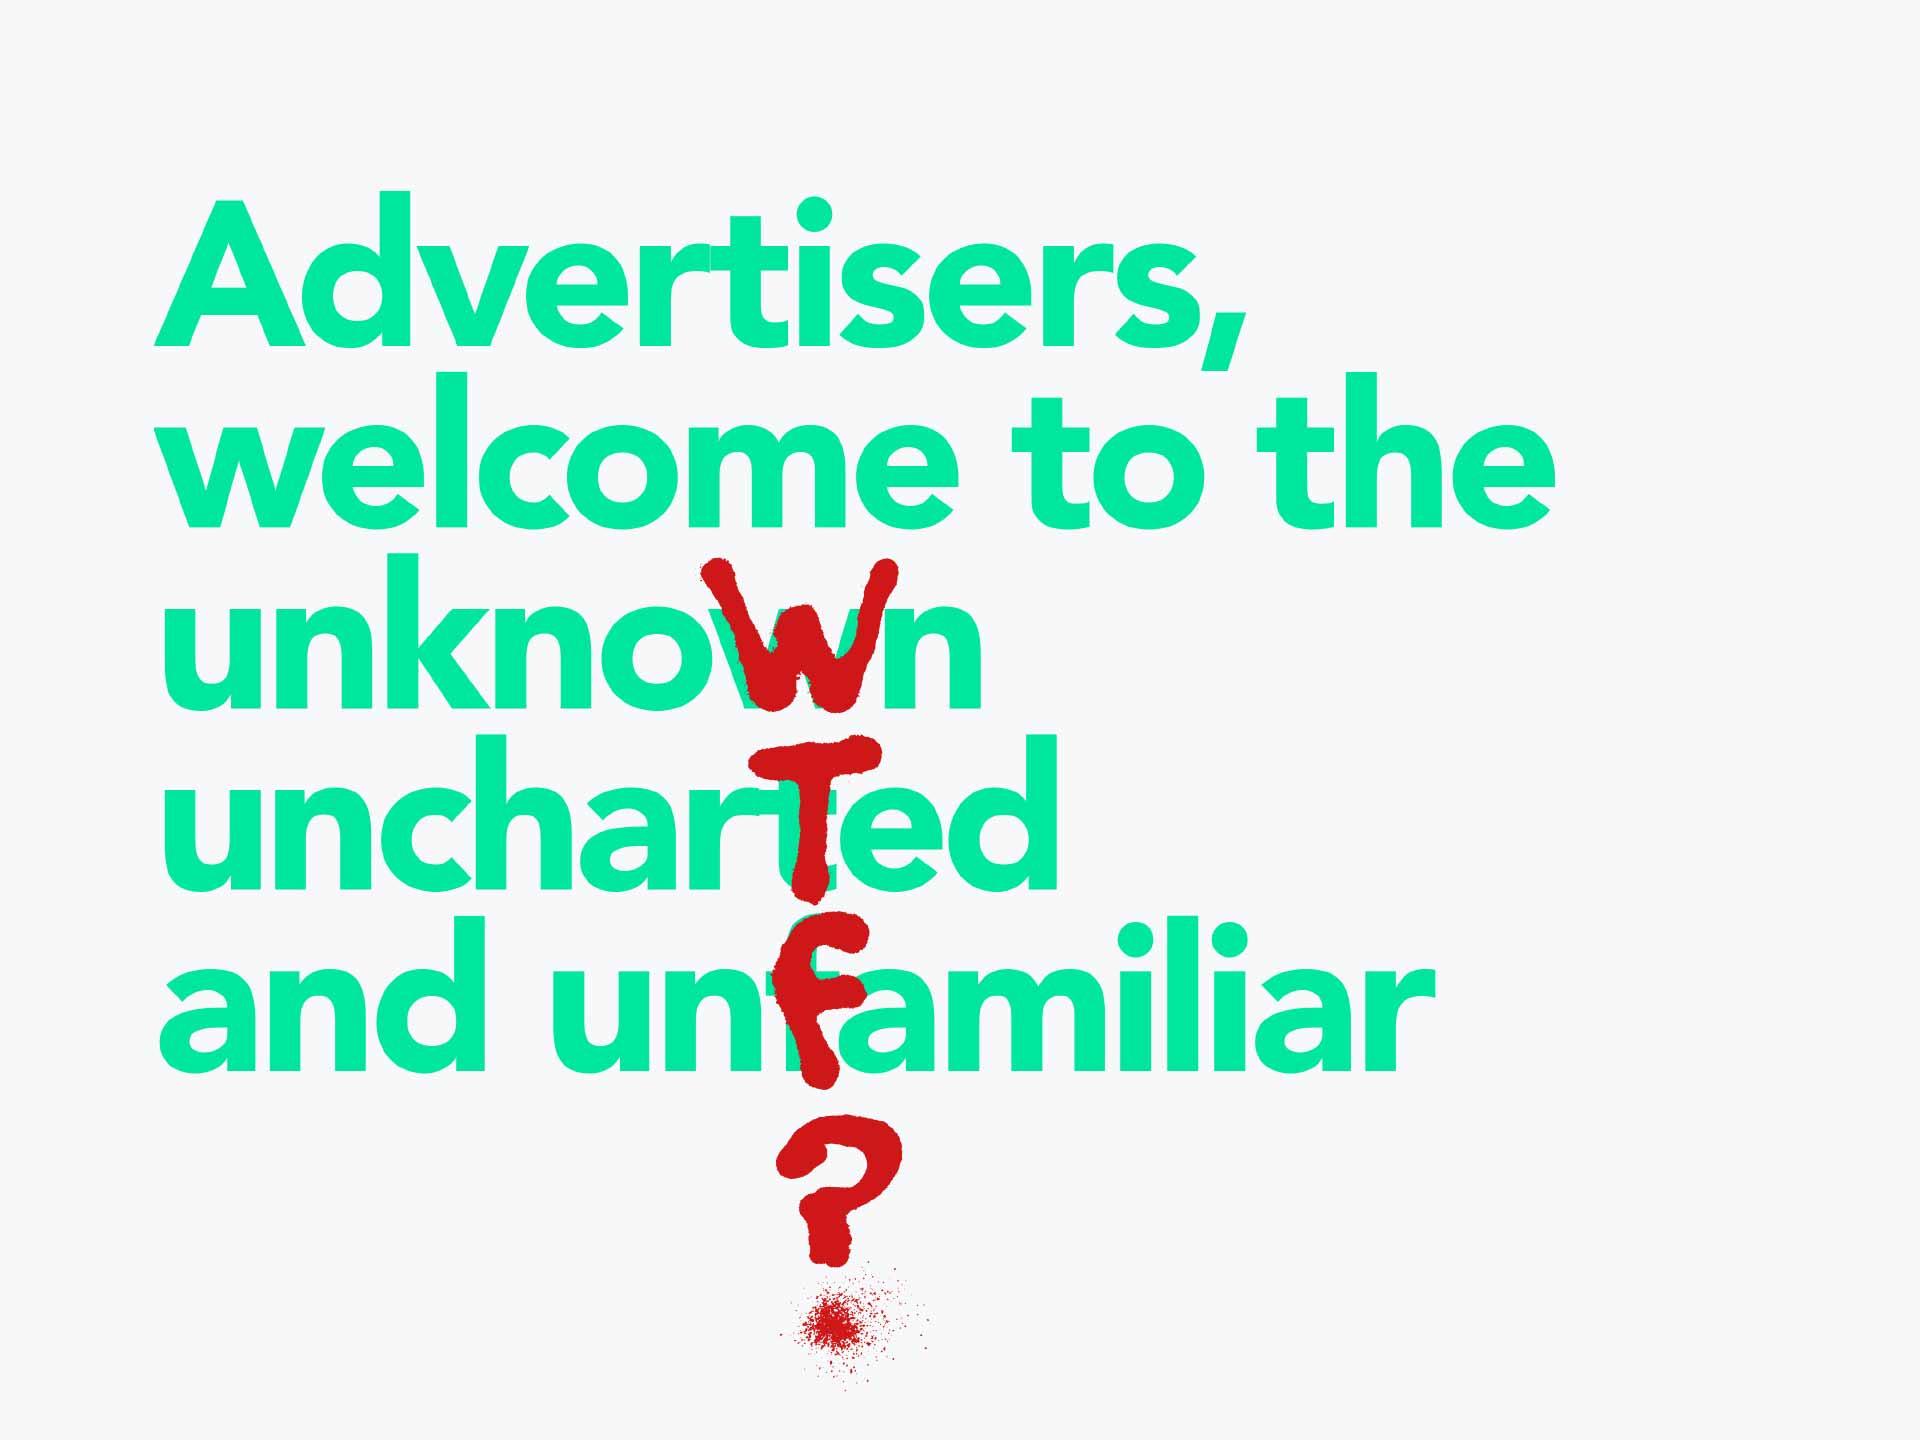 Advertising strategies for a post-lockdown world